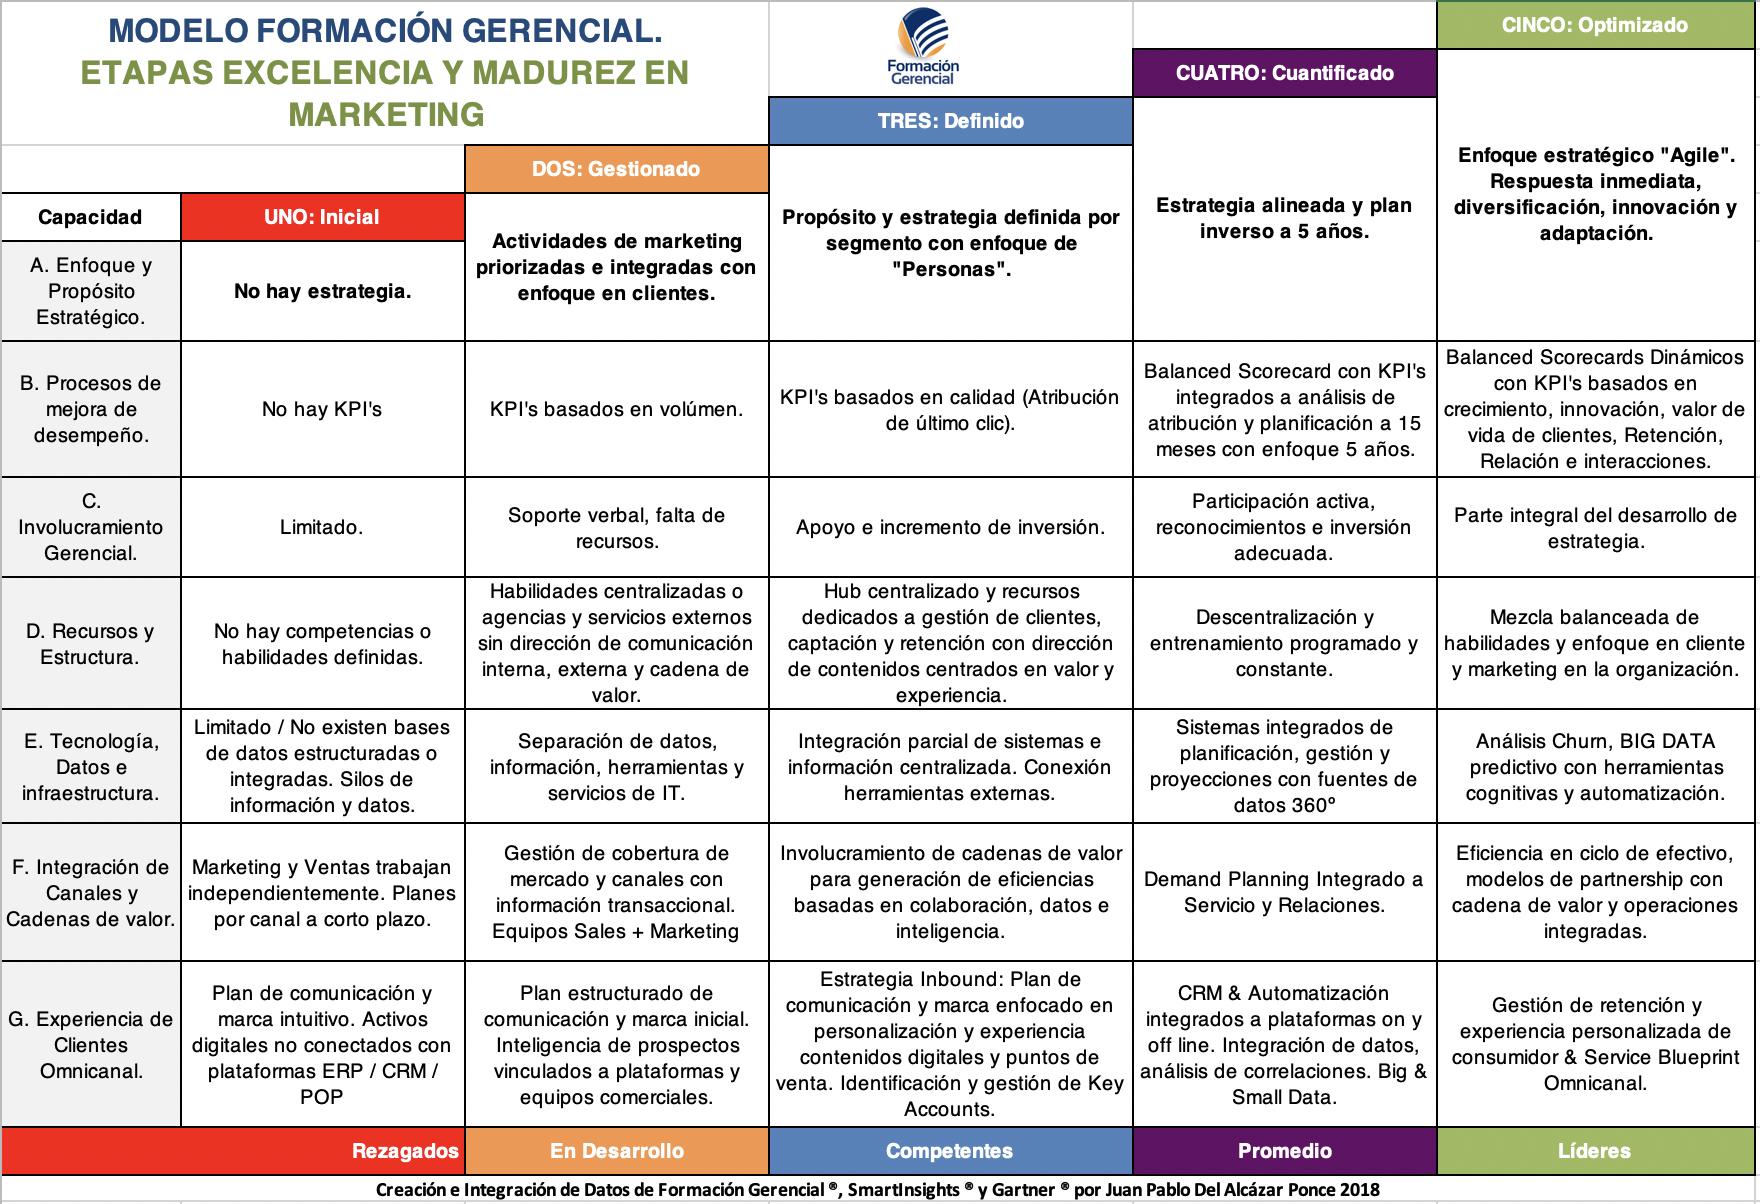 Modelo Madurez Marketing Formación Gerencial